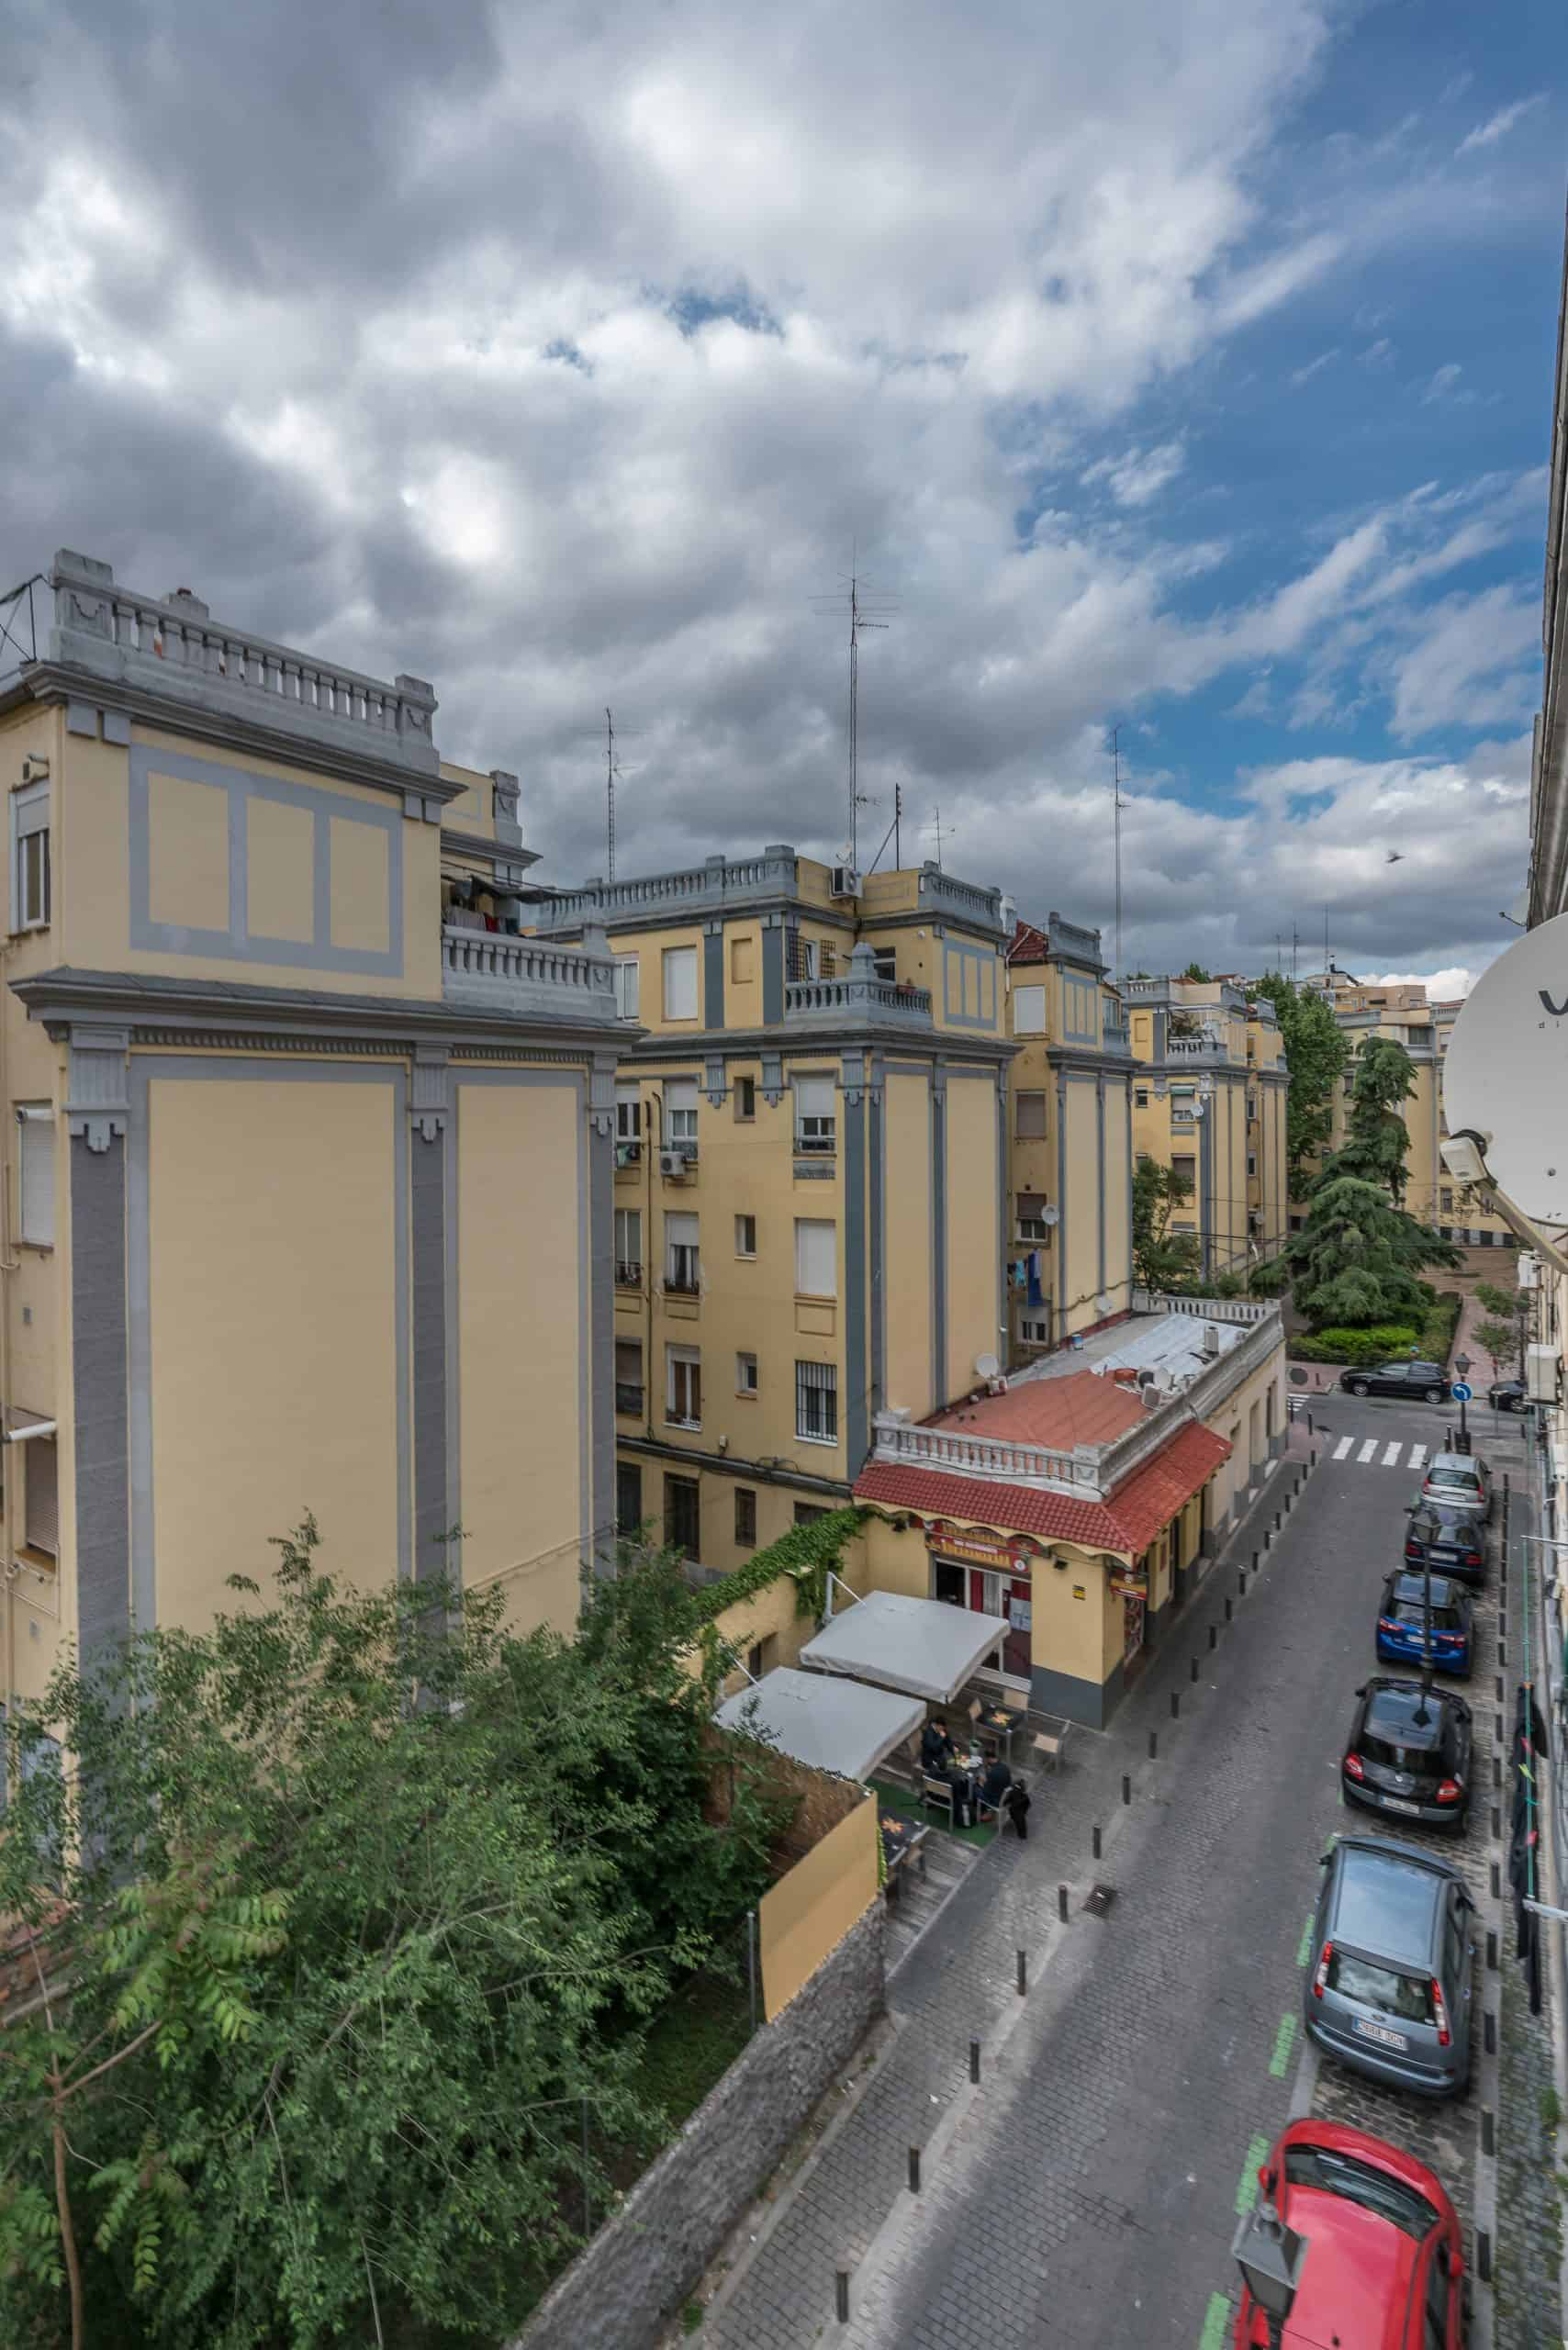 Agencia Inmobiliaria de Madrid-FUTUROCASA-Zona ARGANZUELA-EMBAJADORES-LEGAZPI7 VISTAS (4)